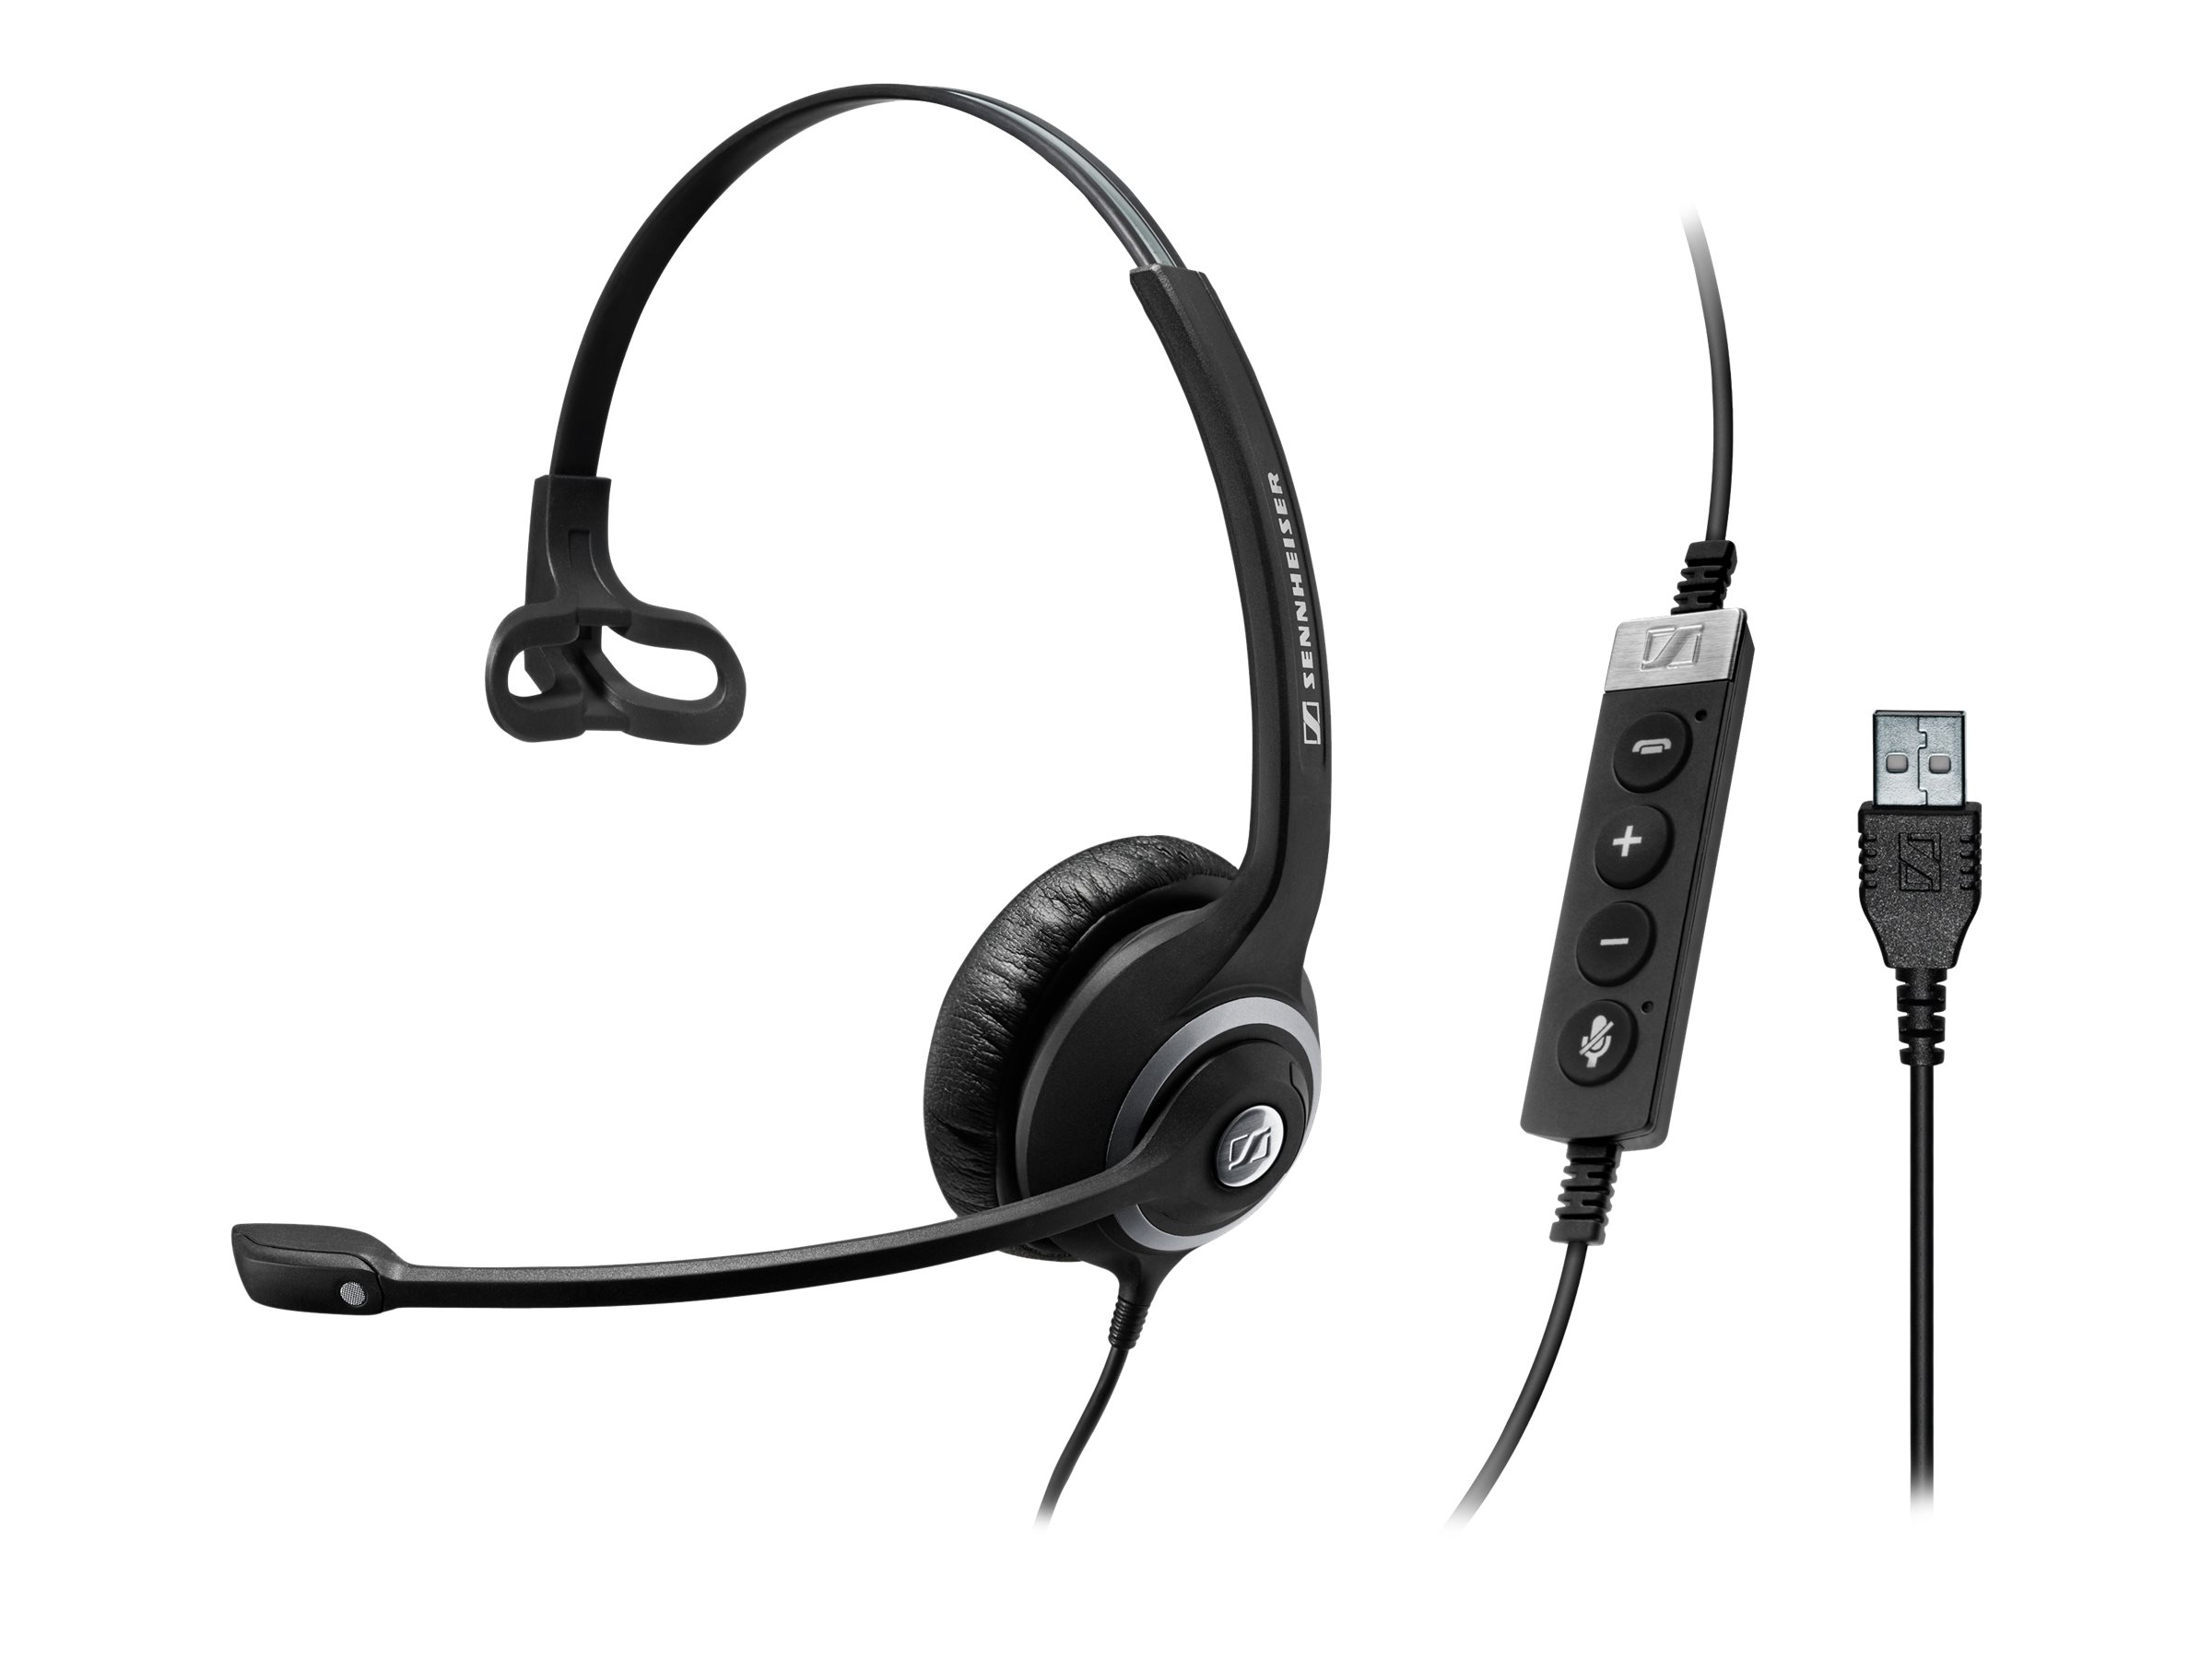 Sennheiser Circle SC 230 USB CTRL II - Headset - On-Ear - kabelgebunden - aktive Rauschunterdrückung - USB